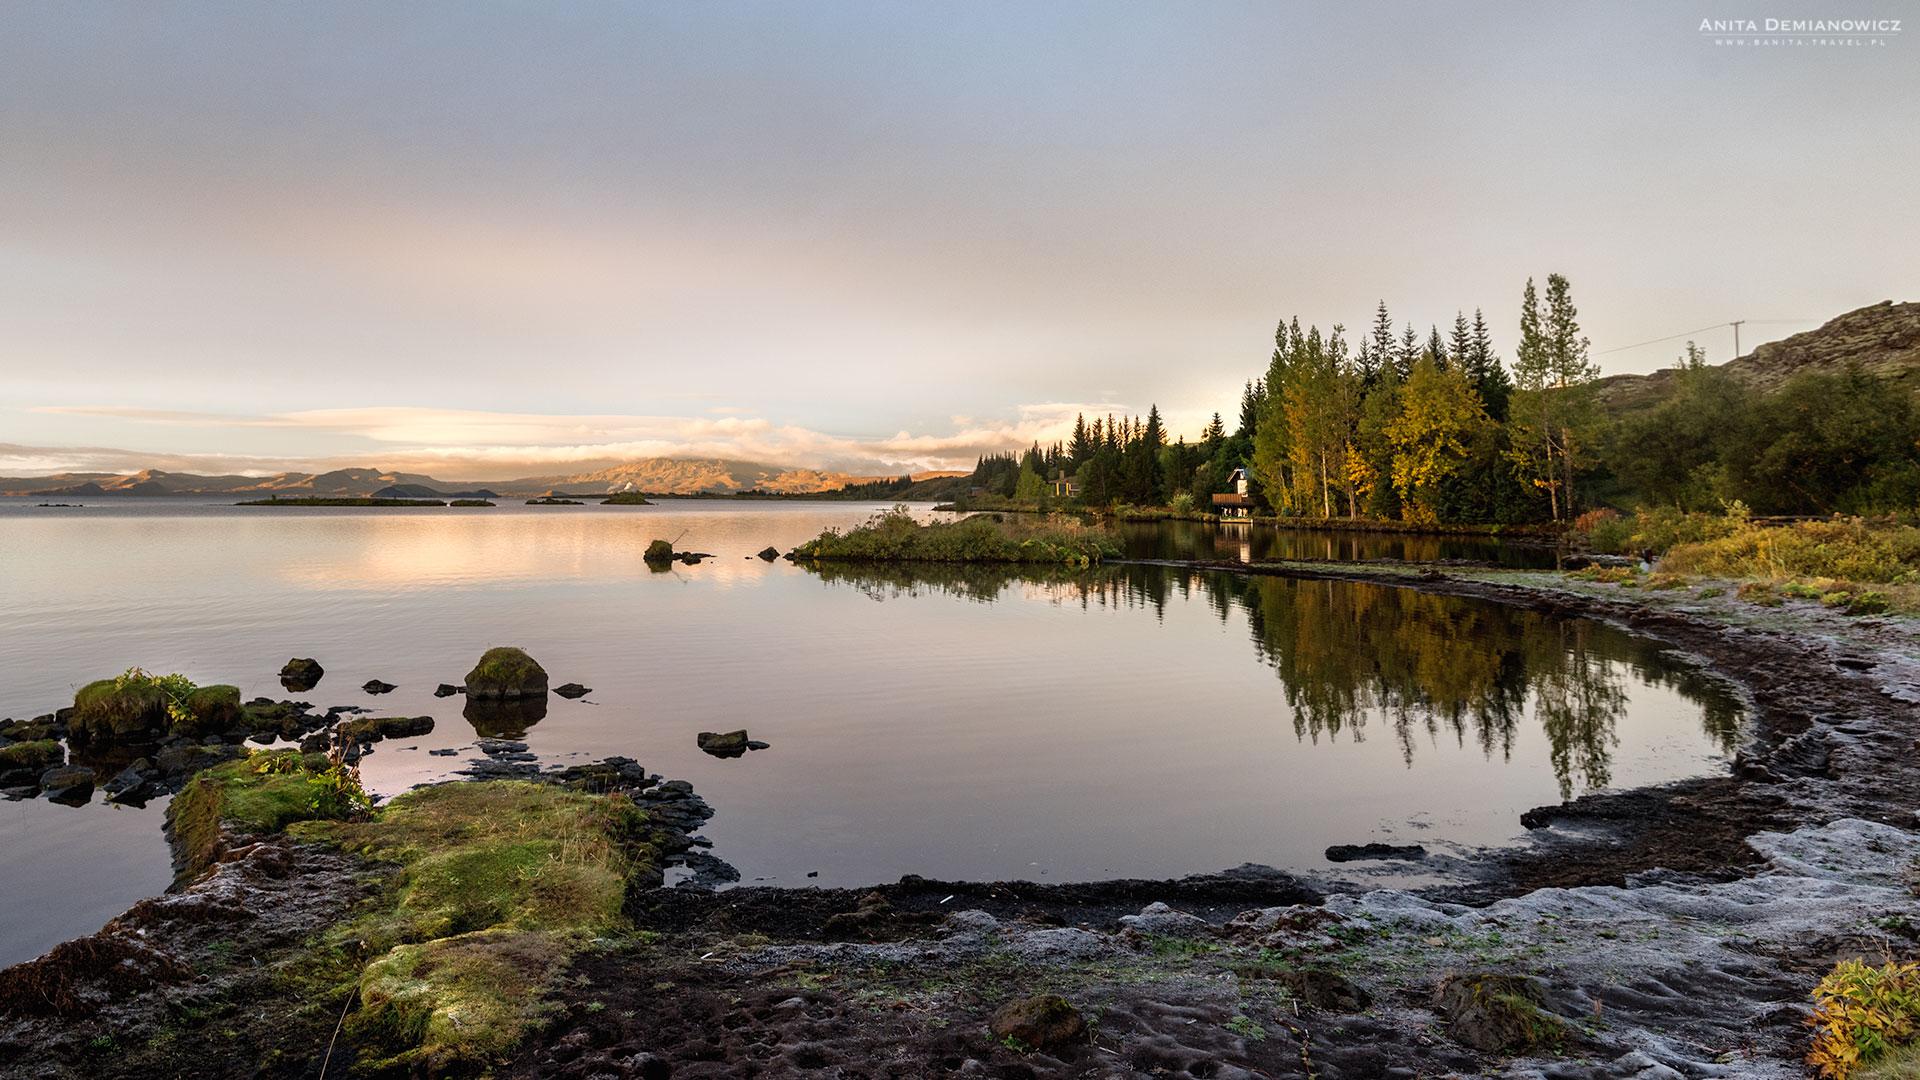 Jezioro Thingvallavatn, Islandia, Anita Demianowicz